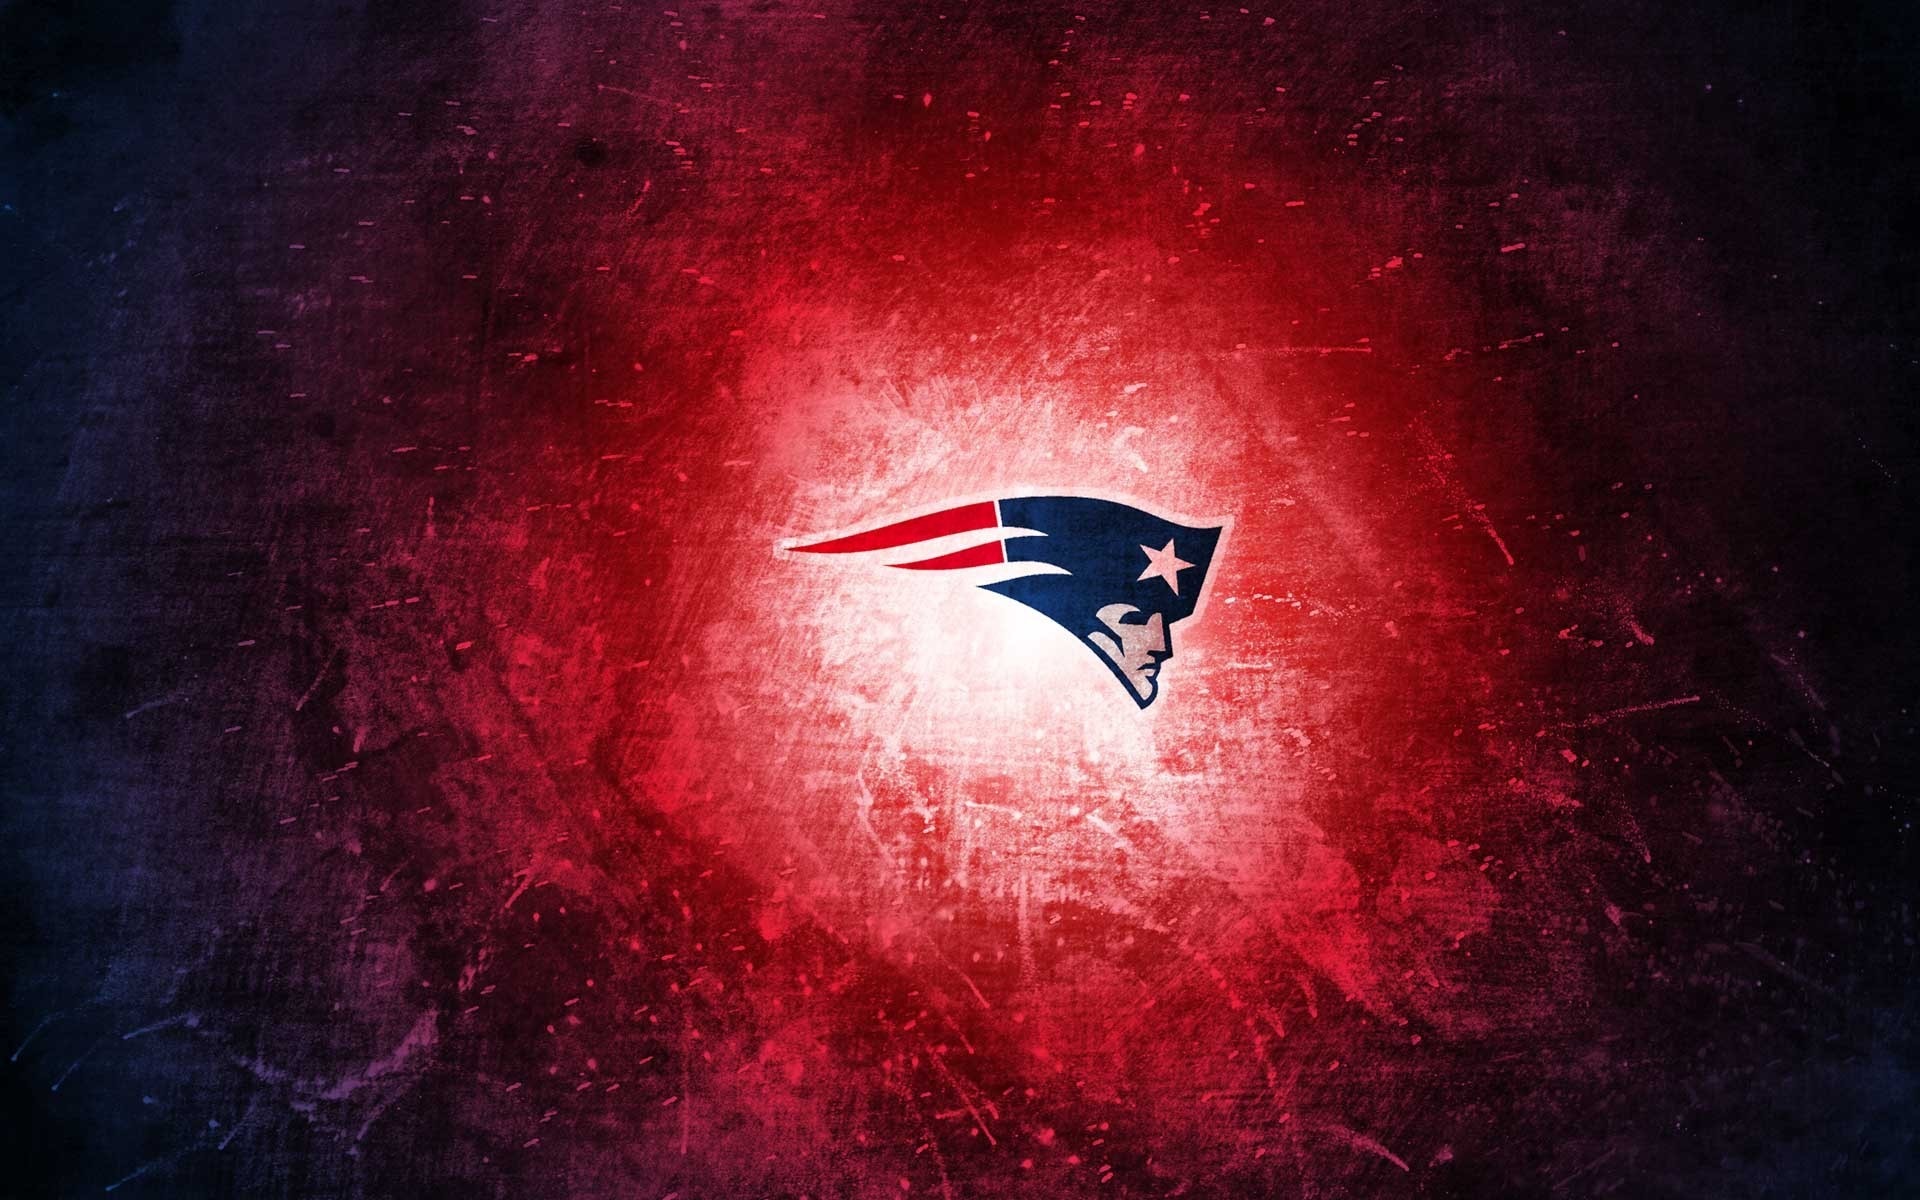 1080x1920 Tom Brady New England Patriots